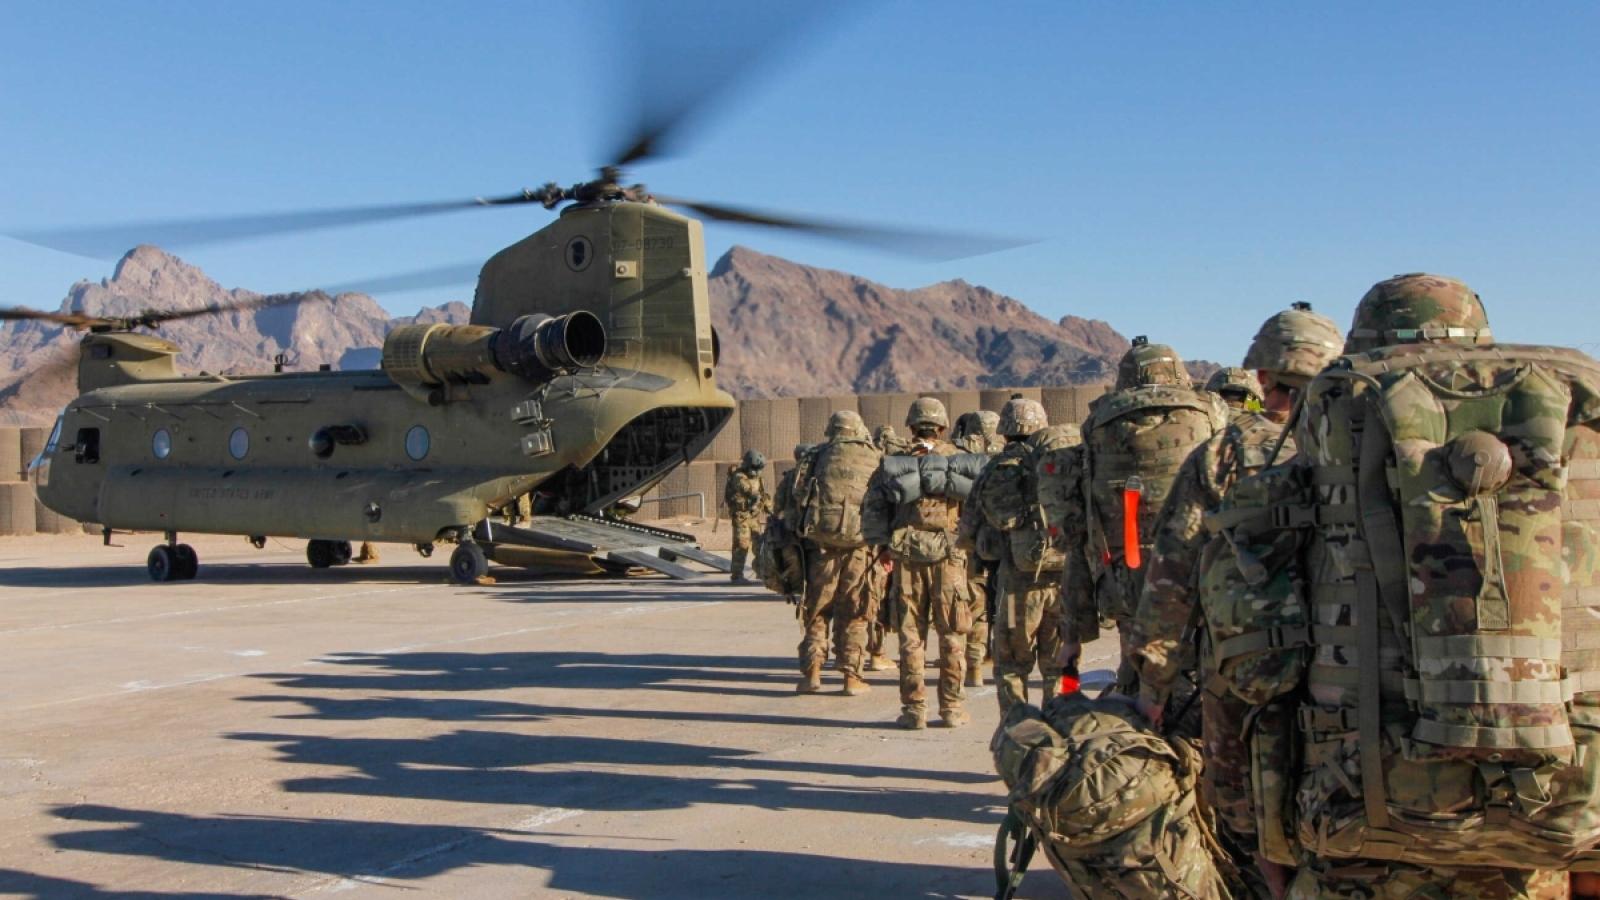 Ai sẽ lấp khoảng trống tại Afghanistan sau khi Mỹ rời đi?